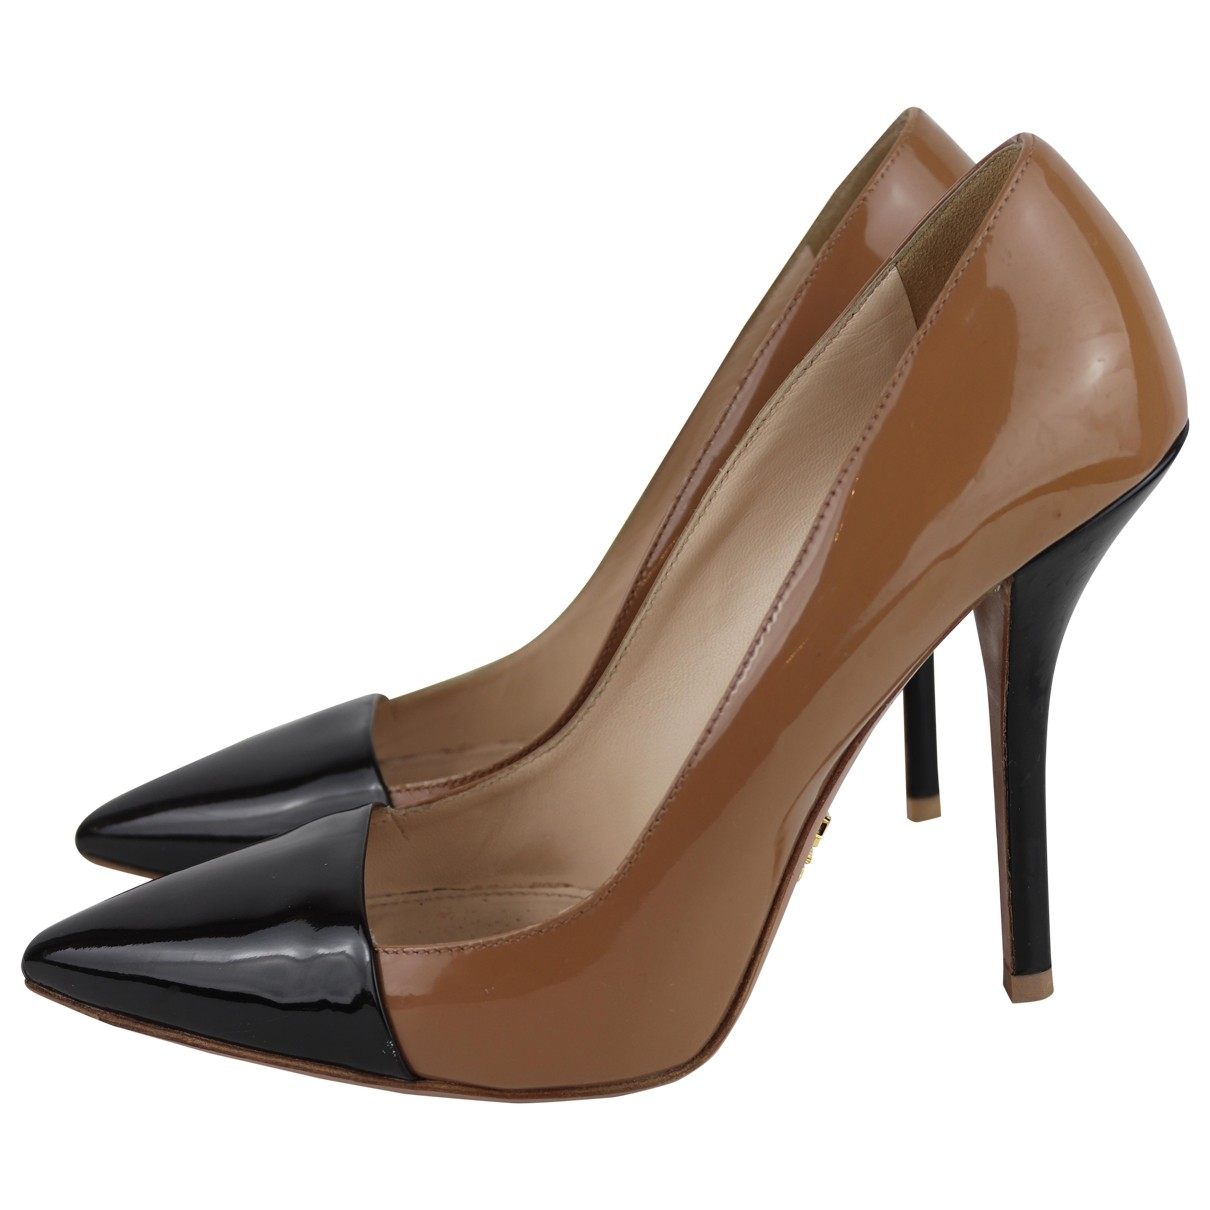 Prada \N Camel Patent leather Heels for Women 39 EU